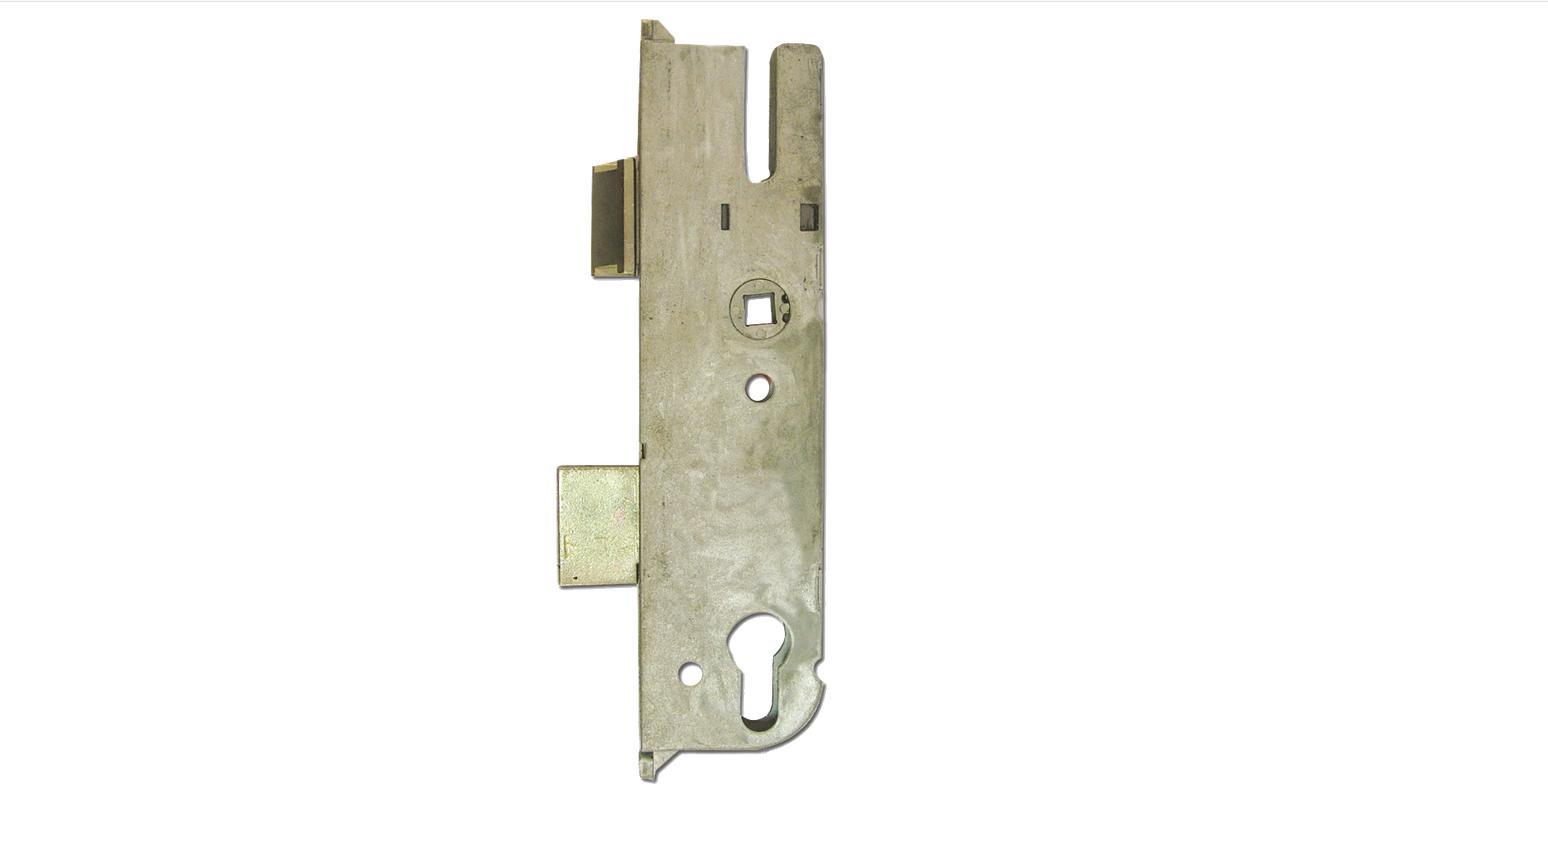 Gearbox 35mm GU Single Spindle